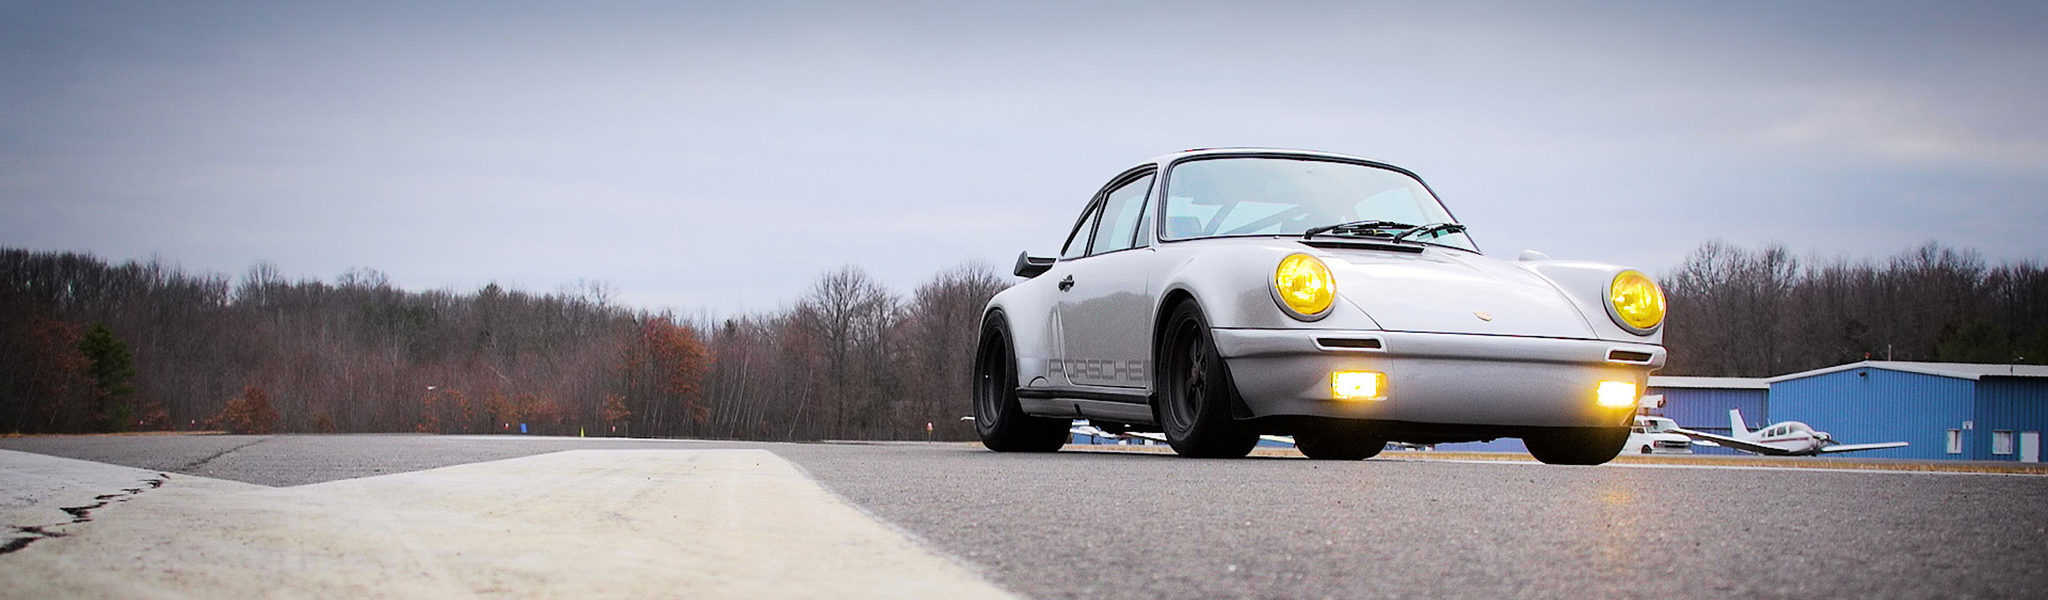 Less is More- IDAtude 930 Porsche